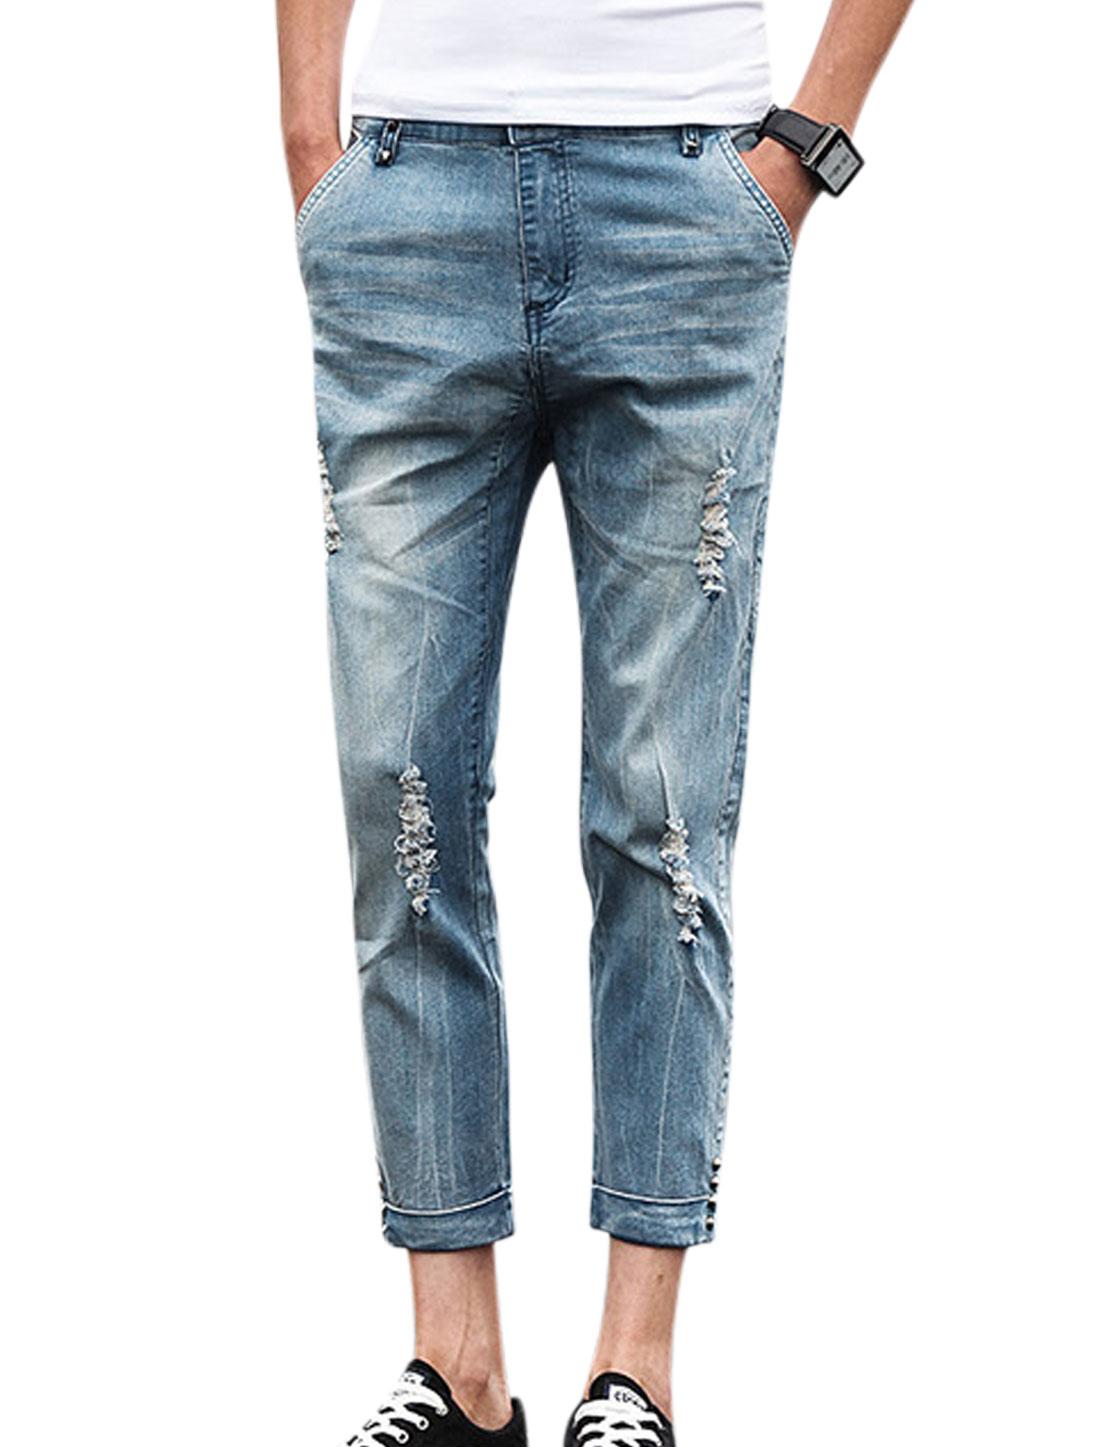 Men Mid Rise Pockets Destroyed Rivets Decor Casual Jeans Sky Blue W28